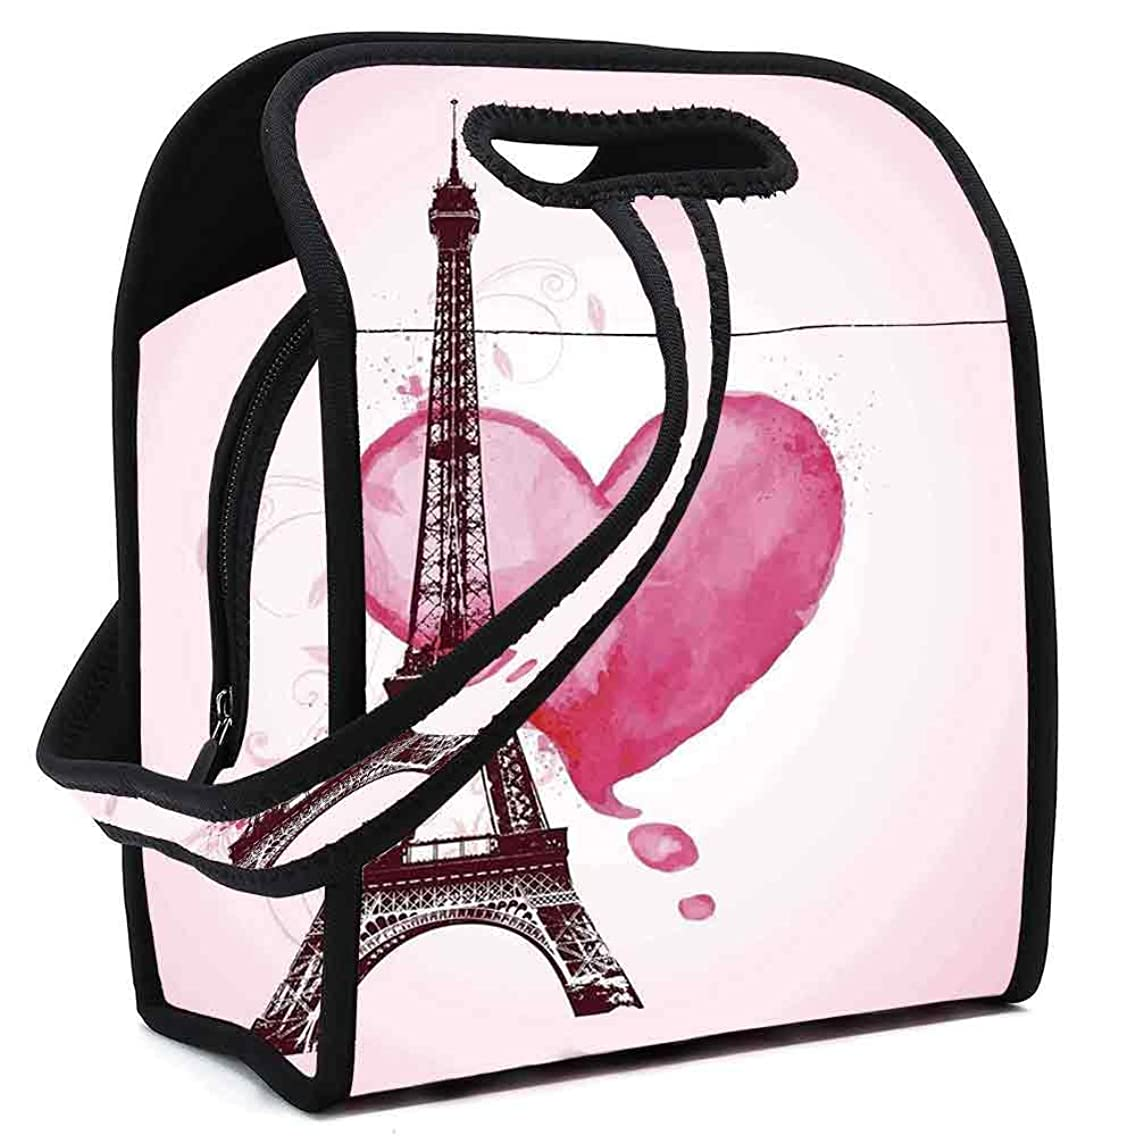 Eiffel Tower Decor Stylish Neoprene Lunch Bag,Eiffel Romantic Valentine Love Watercolor Themed Heart Leaf Silhouette Print for Women Girls Kids,Square(8.5''L x 5.5''W x 11''H)